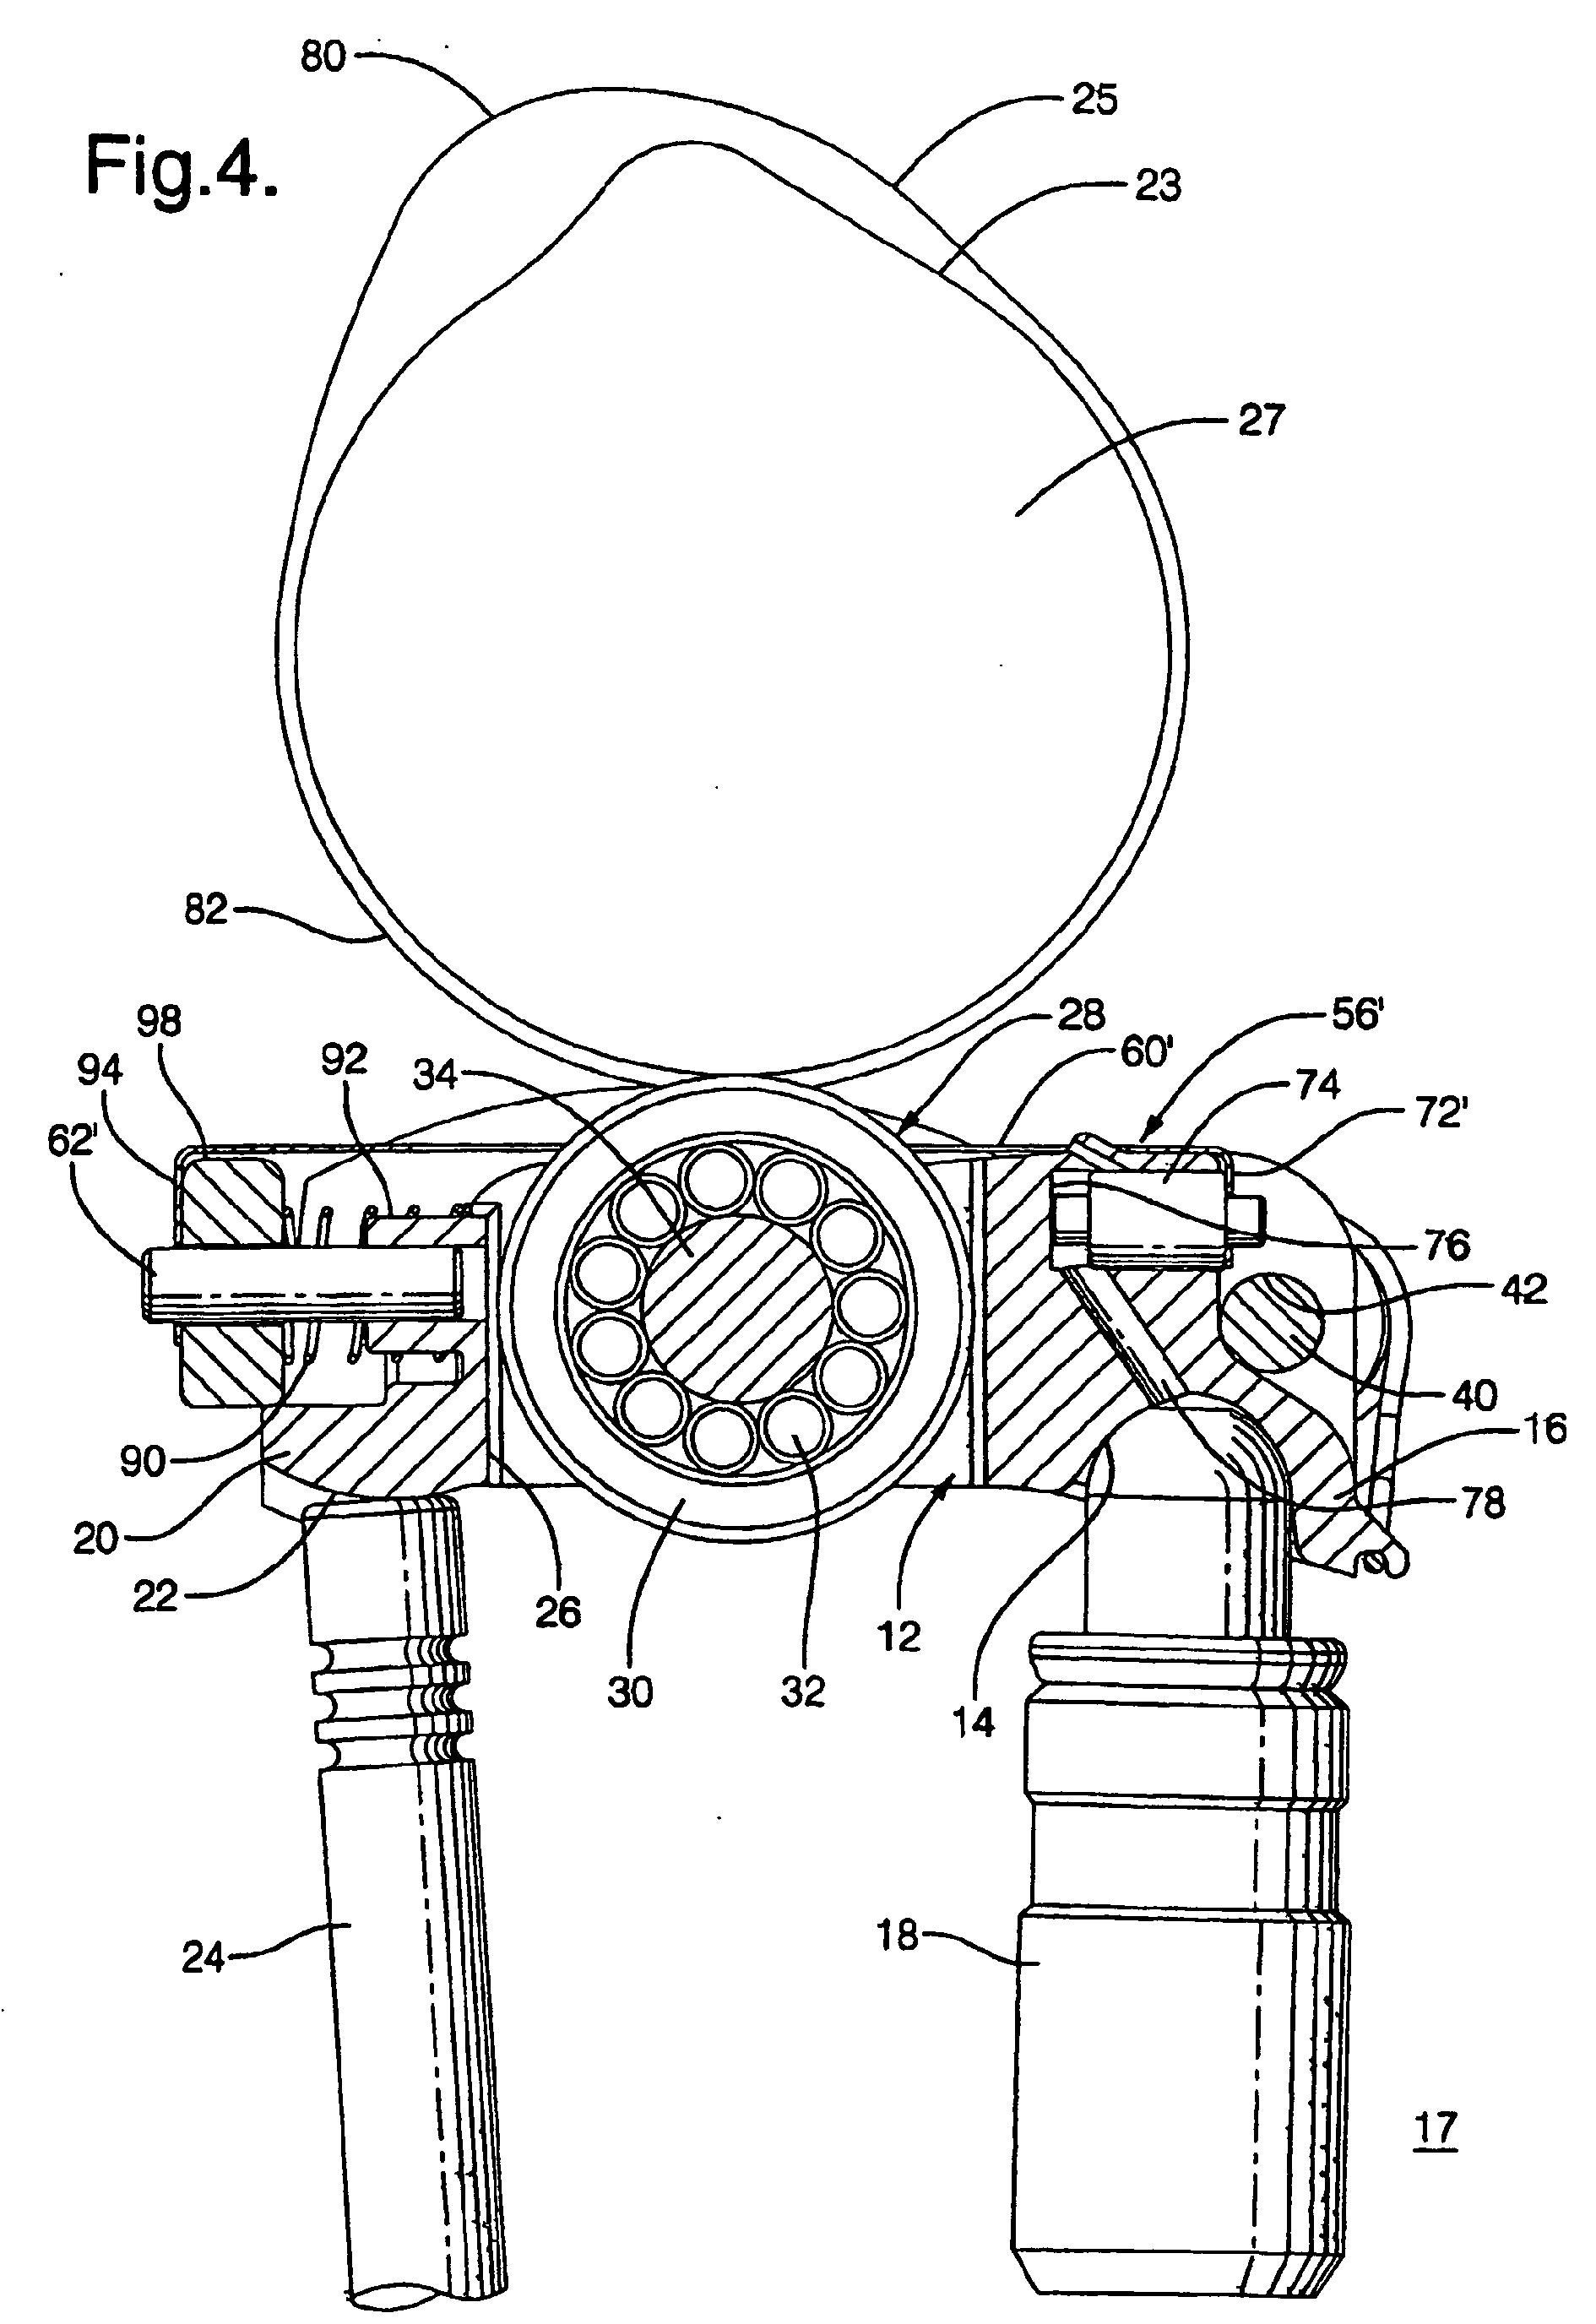 brevet ep1367228b1 culbuteur du type linguet deux positions google brevets. Black Bedroom Furniture Sets. Home Design Ideas